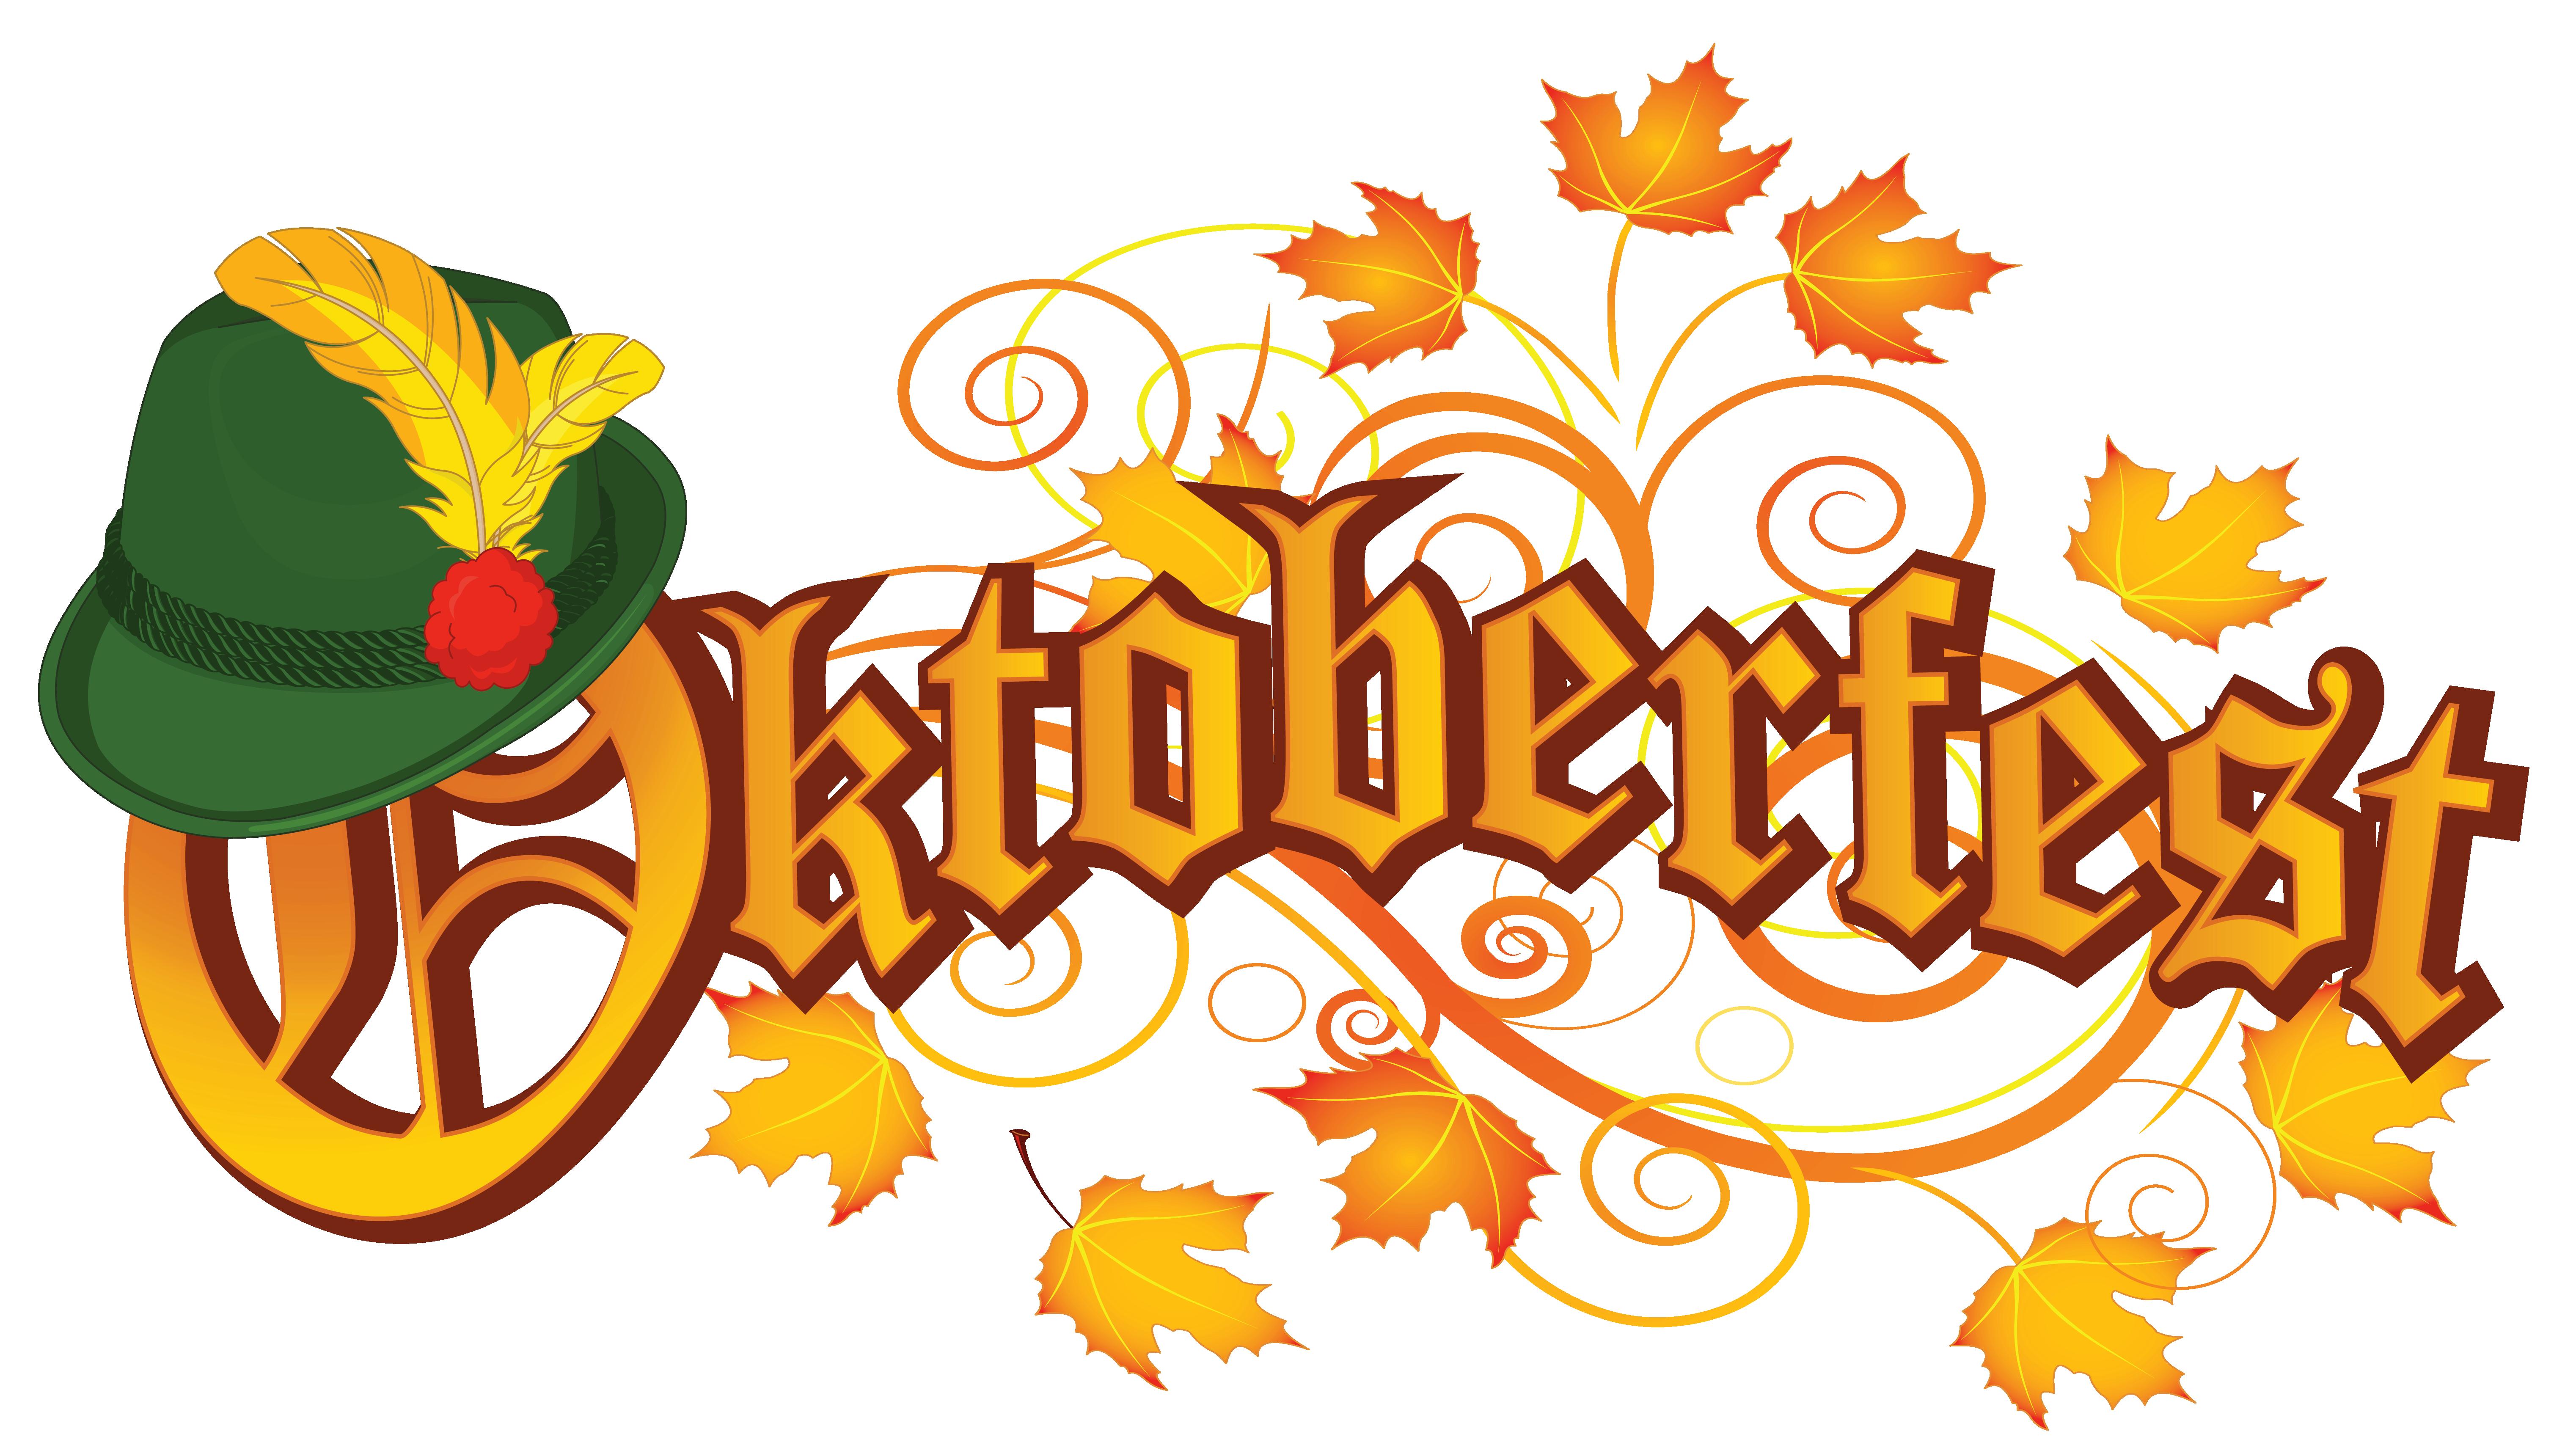 6062x3441 15 Oktoberfest Vector Man For Free Download On Mbtskoudsalg